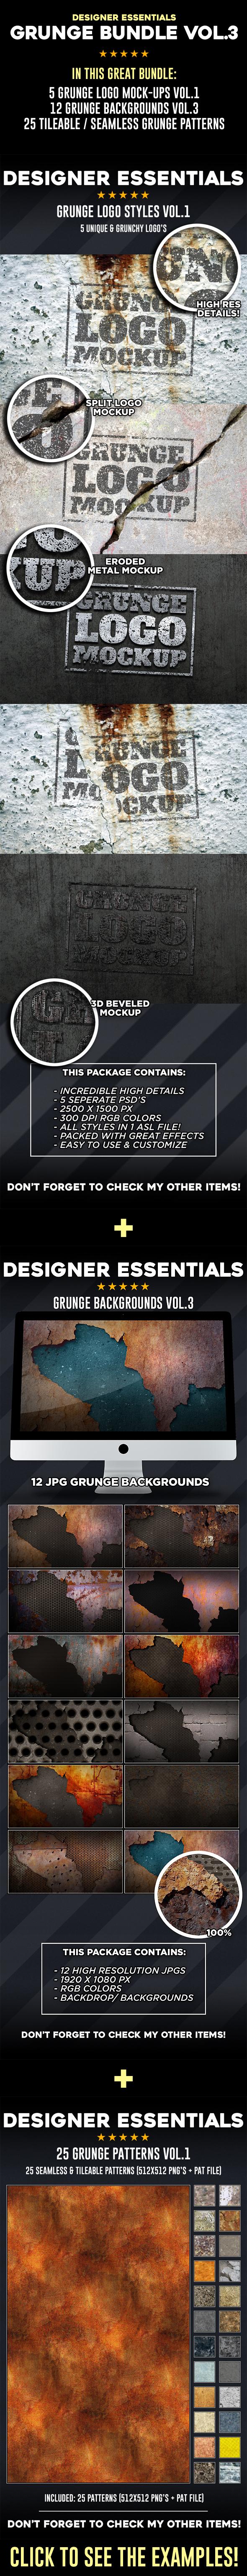 Grunge Bundle Vol.3 - Photoshop Add-ons